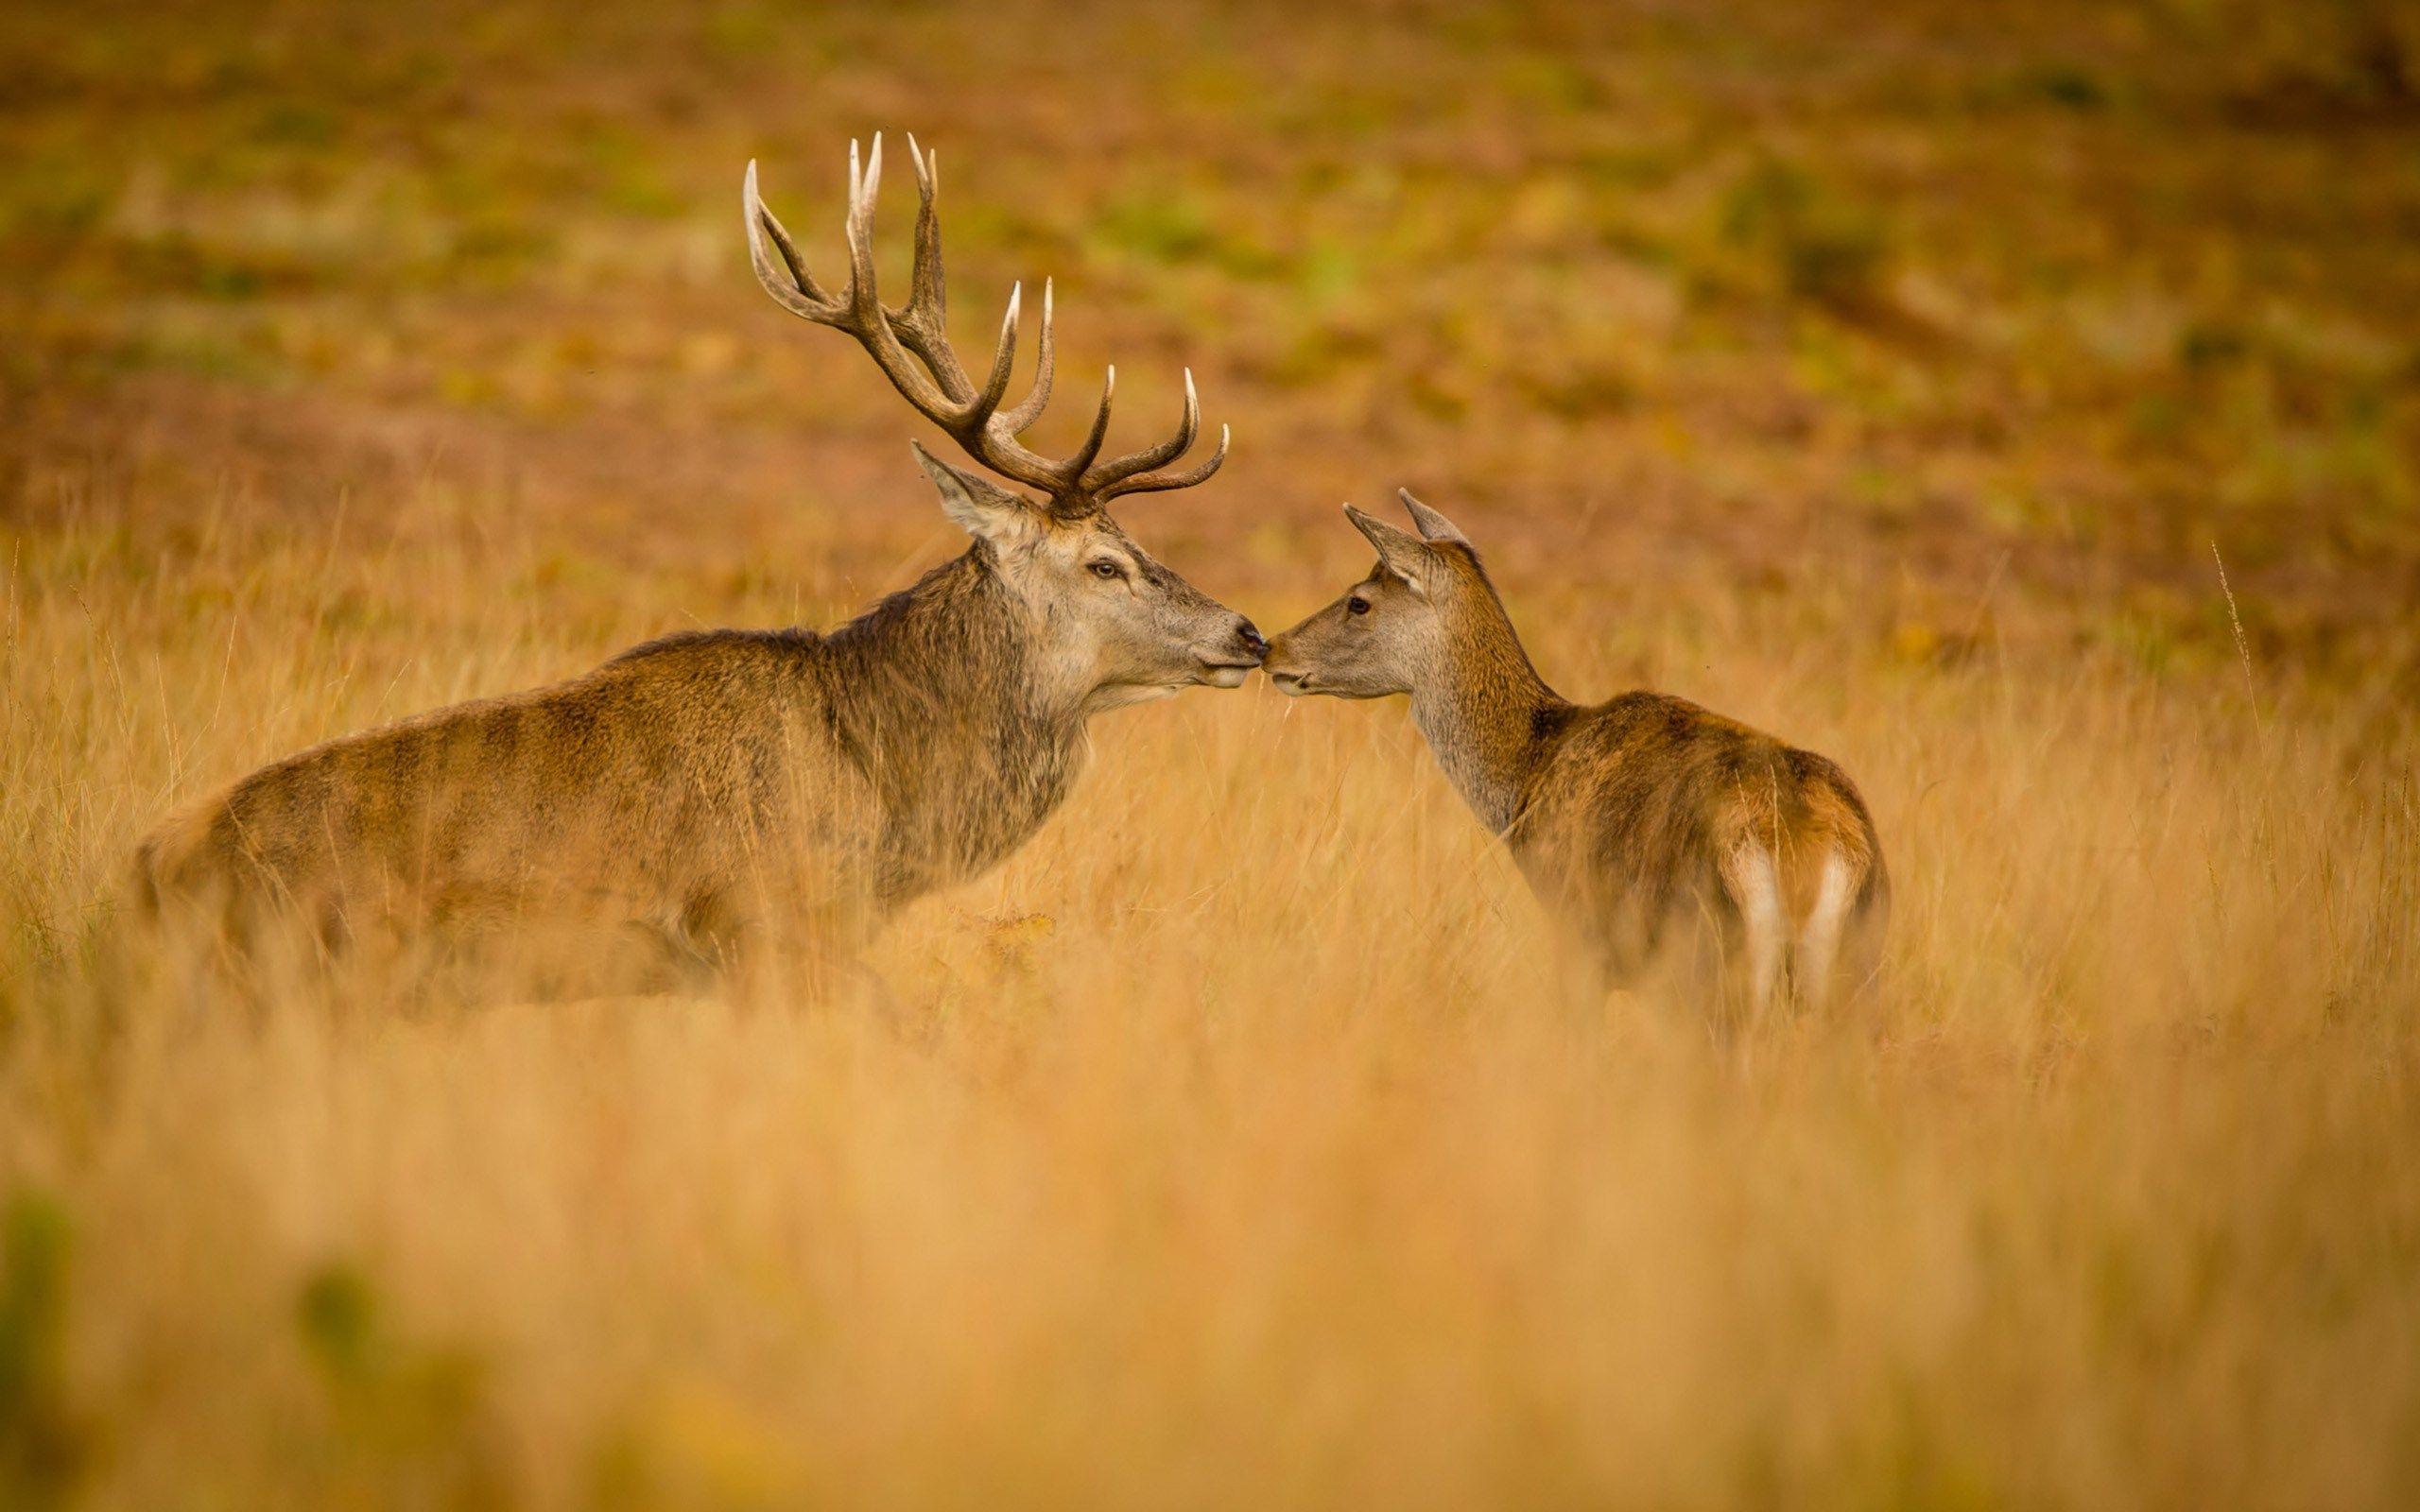 2017 03 03 deer wallpaper full hd backgrounds 1856199 2017 03 03 deer wallpaper full hd backgrounds 1856199 voltagebd Image collections